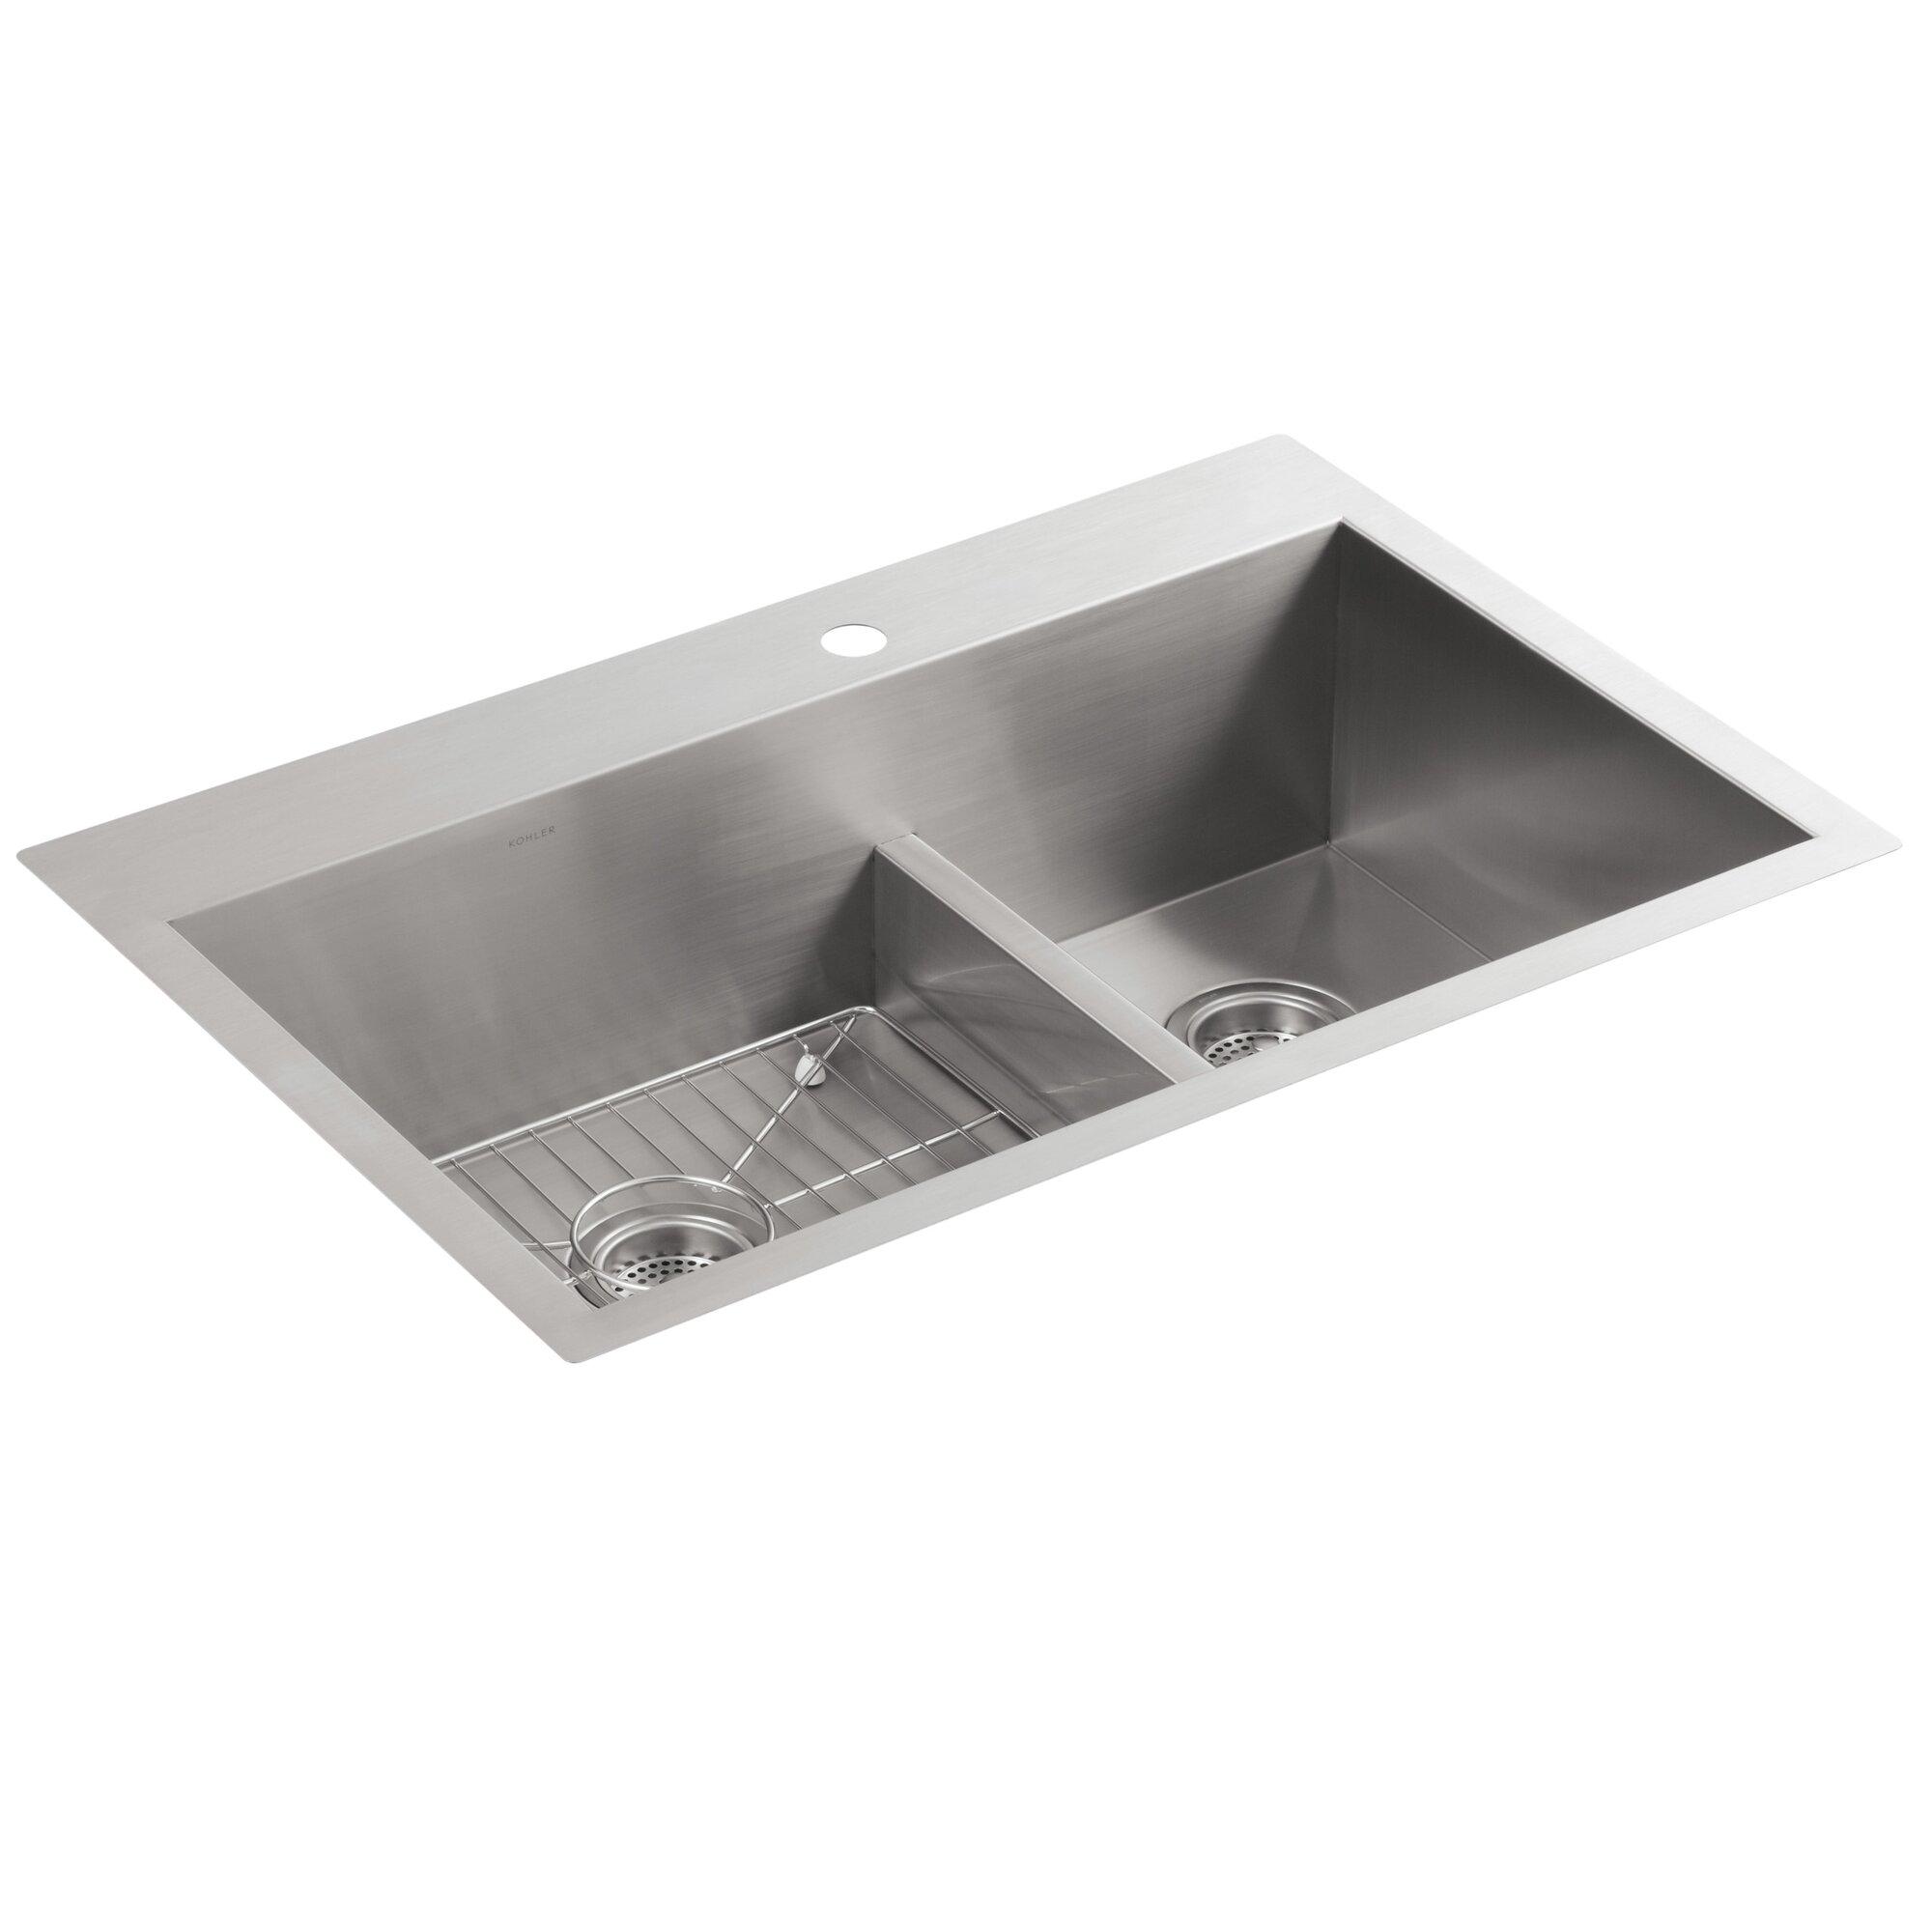 "Top Mount Sink Kitchen: Kohler Vault 33"" X 22"" X 9-5/16"" Smart Divide Top-Mount"